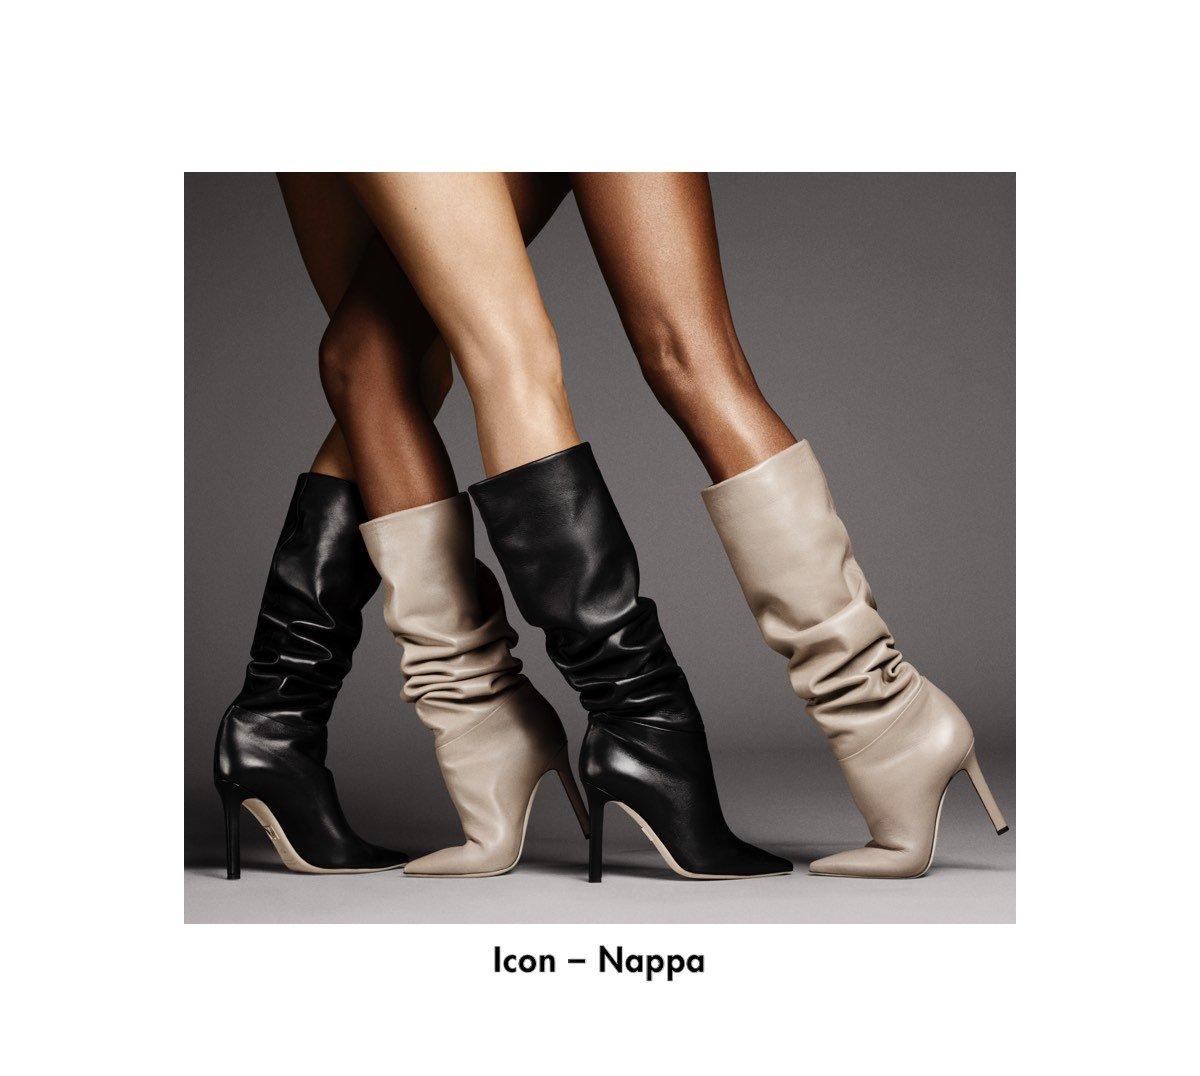 Icon - Nappa